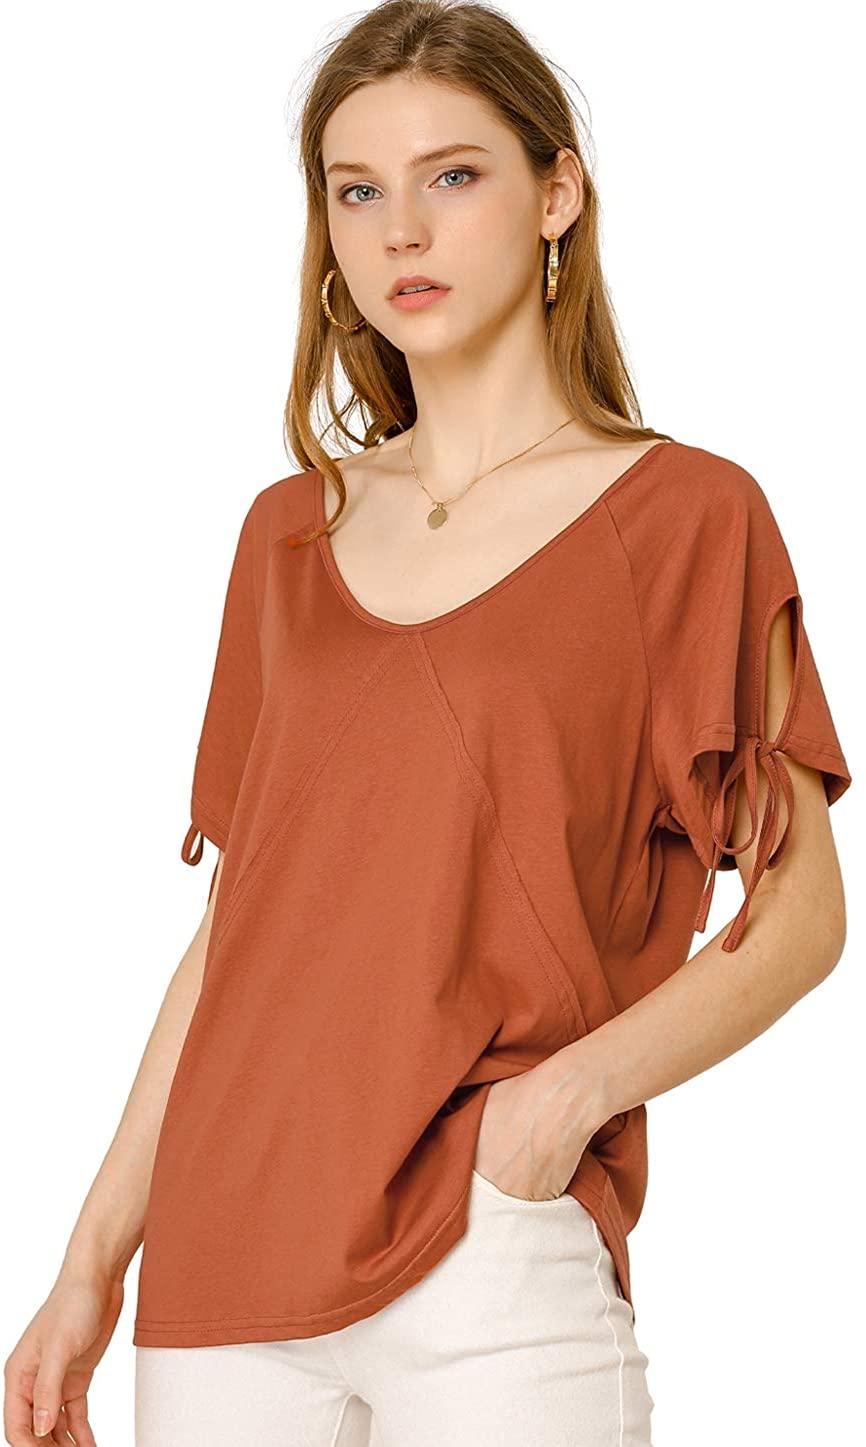 Allegra K Women's V Neck Raglan Short Sleeve Top Cotton Loose T-Shirts